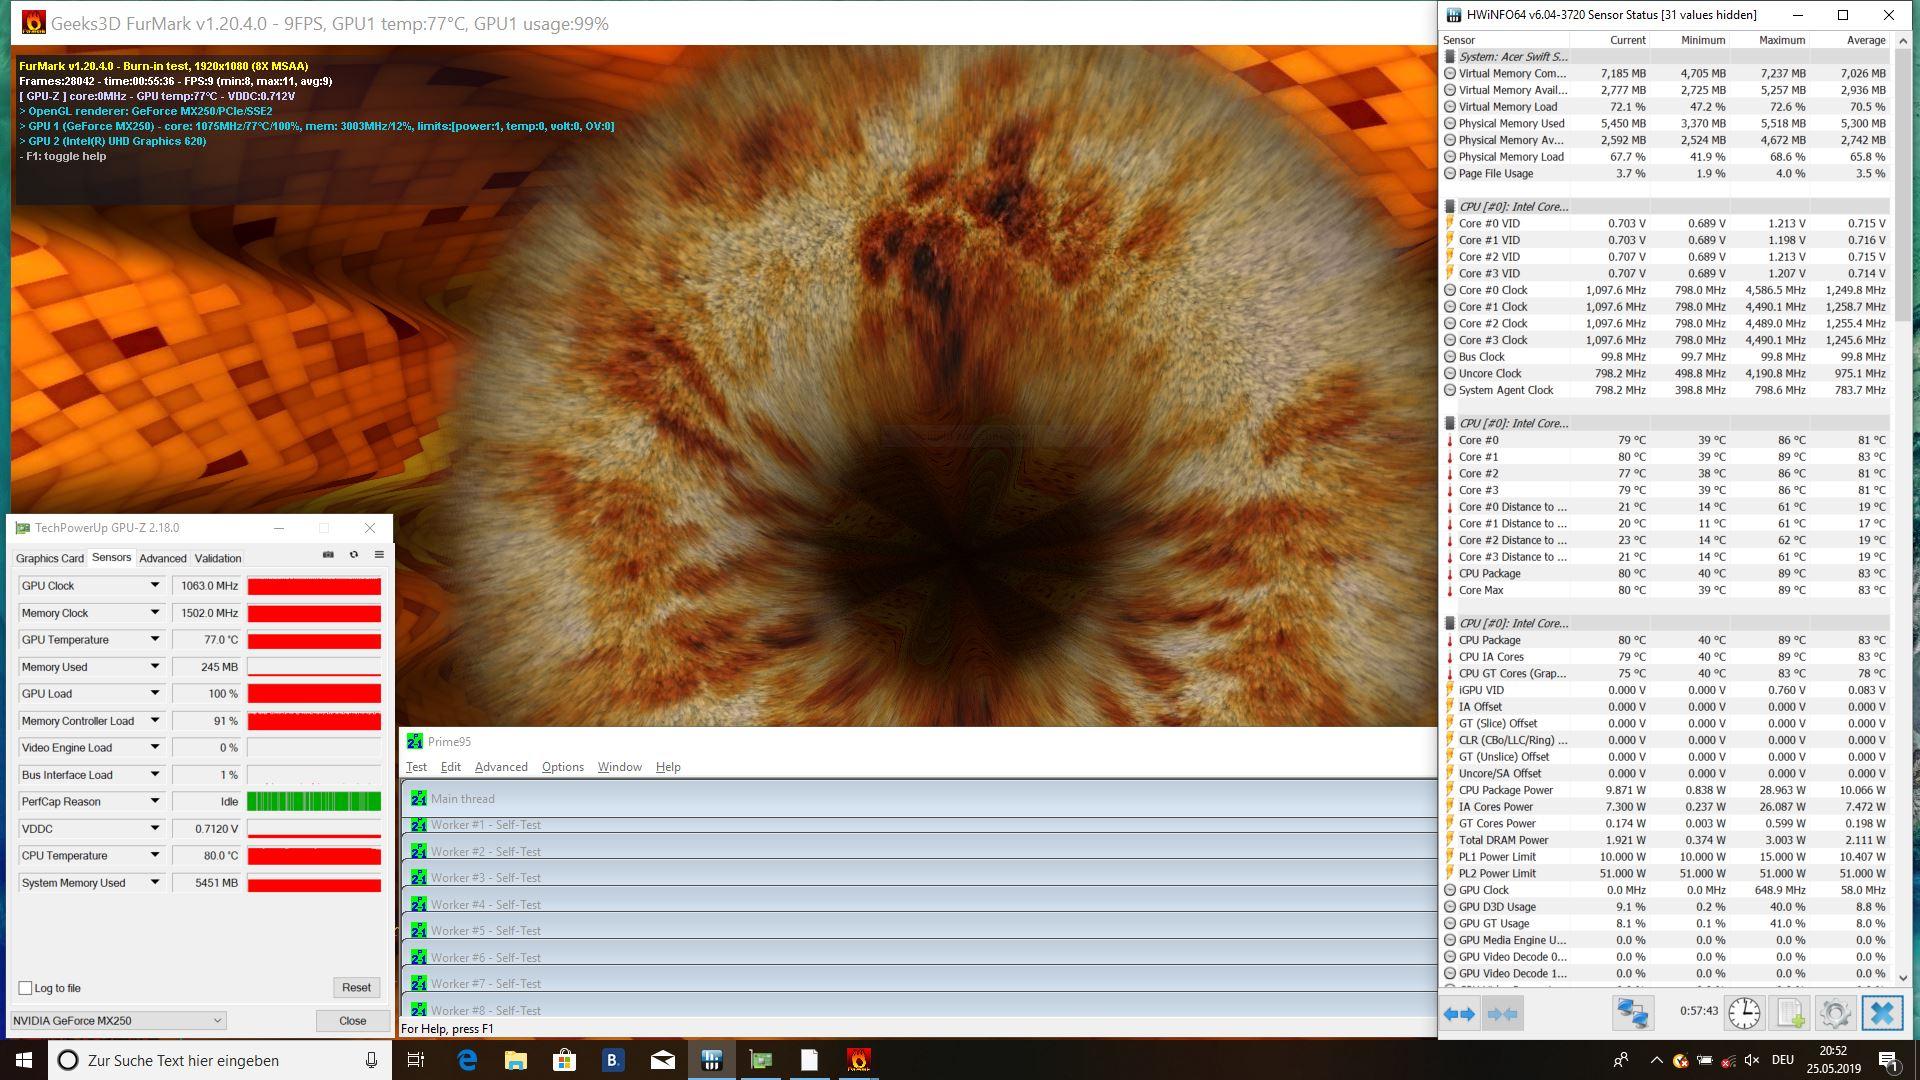 Acer Swift 3 SF314 (i7-8565U, MX250) Laptop Review - NotebookCheck.net Reviews